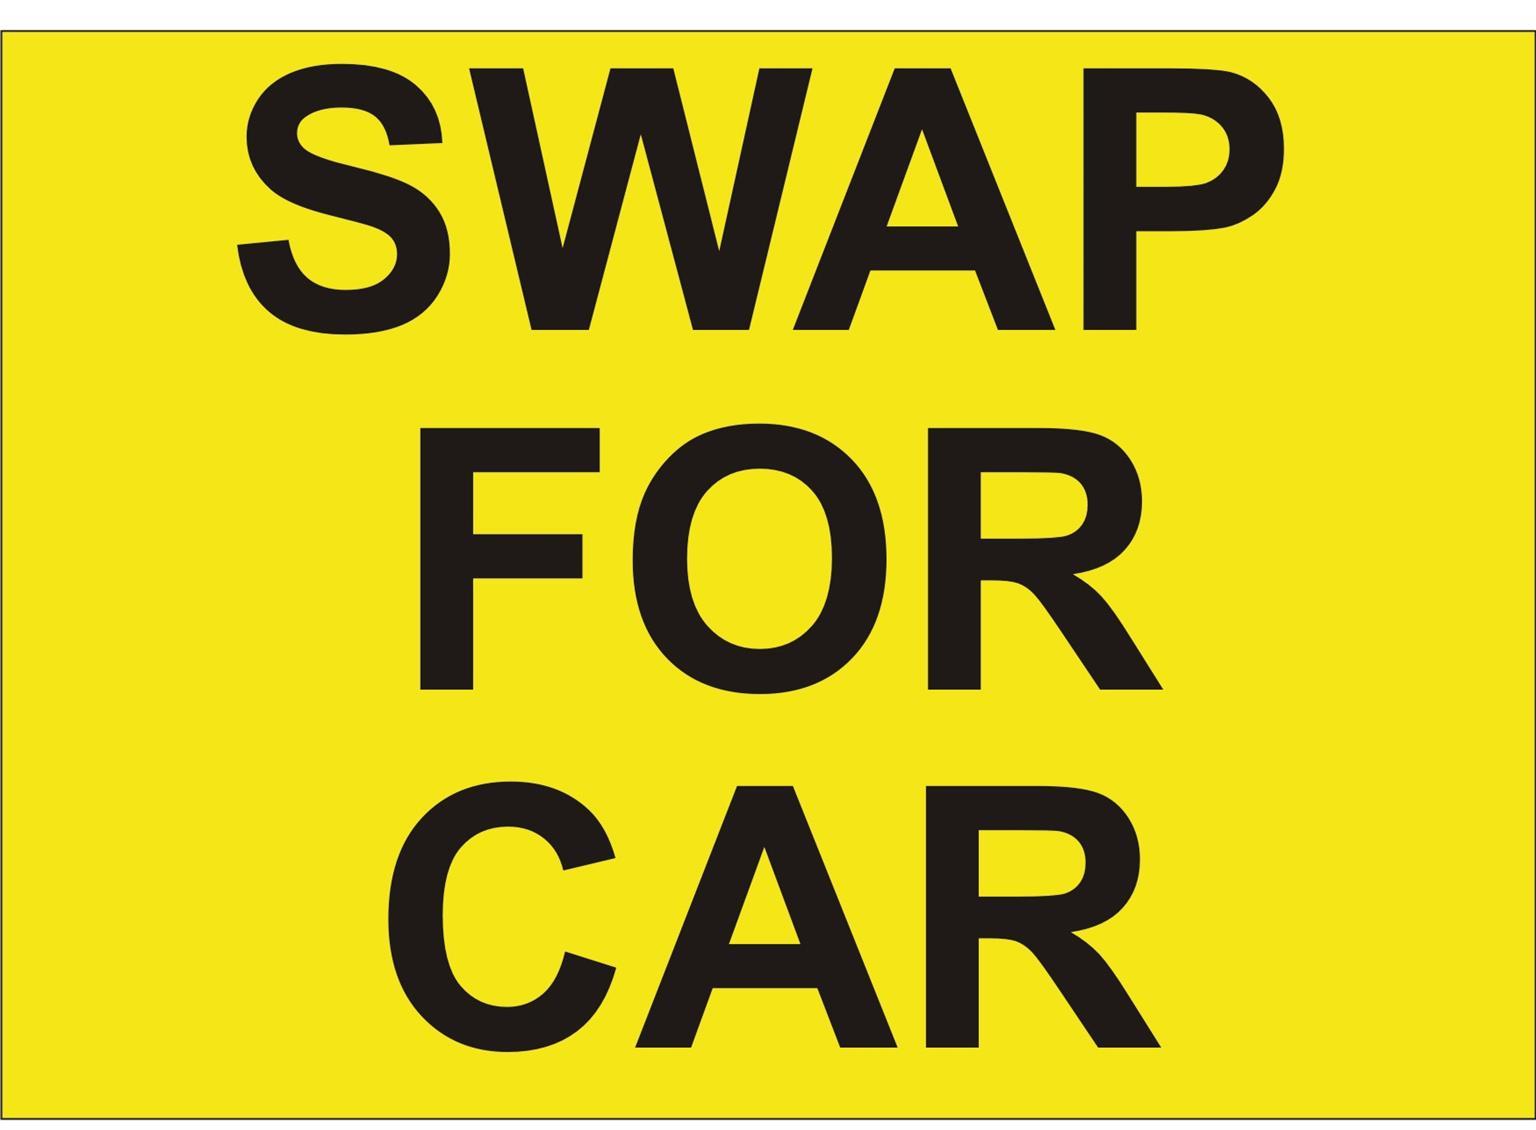 Swap for car